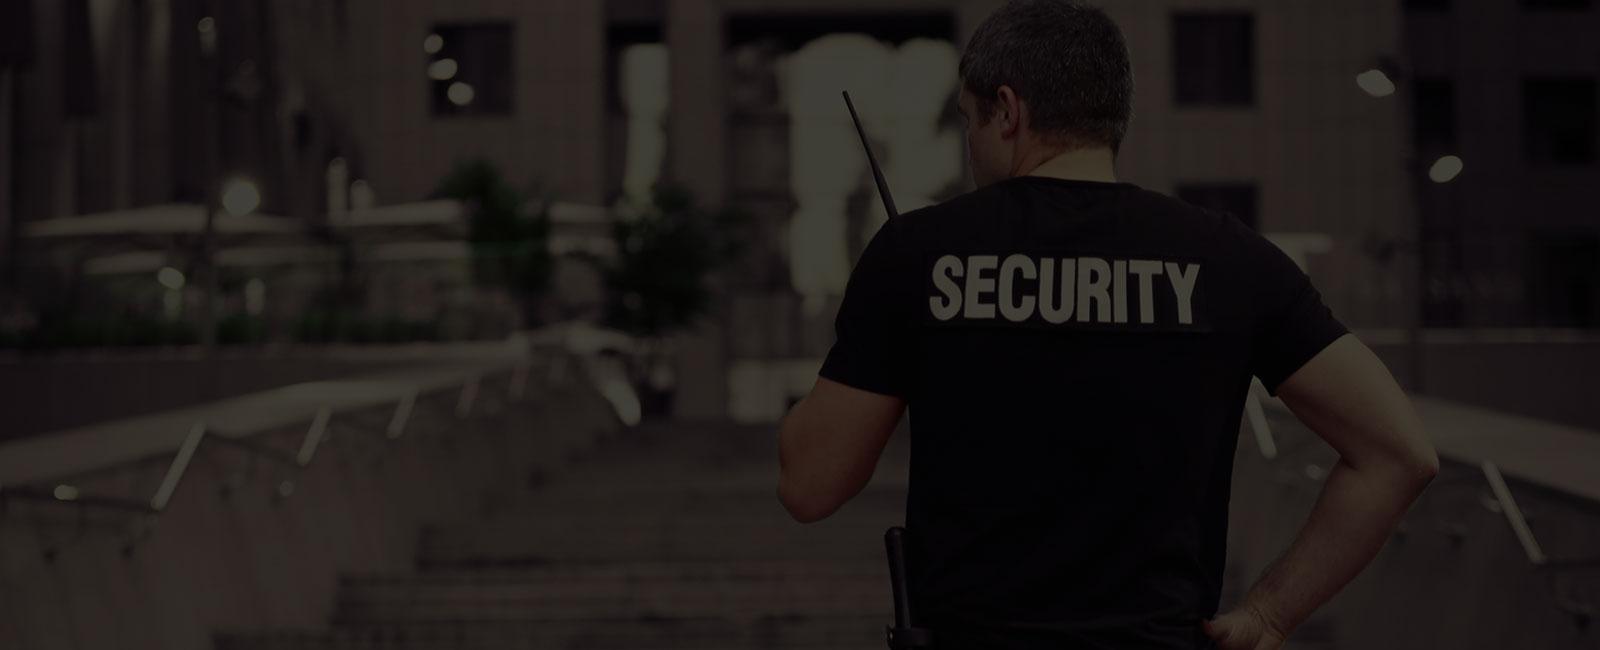 SORT CA State Board of Private Security